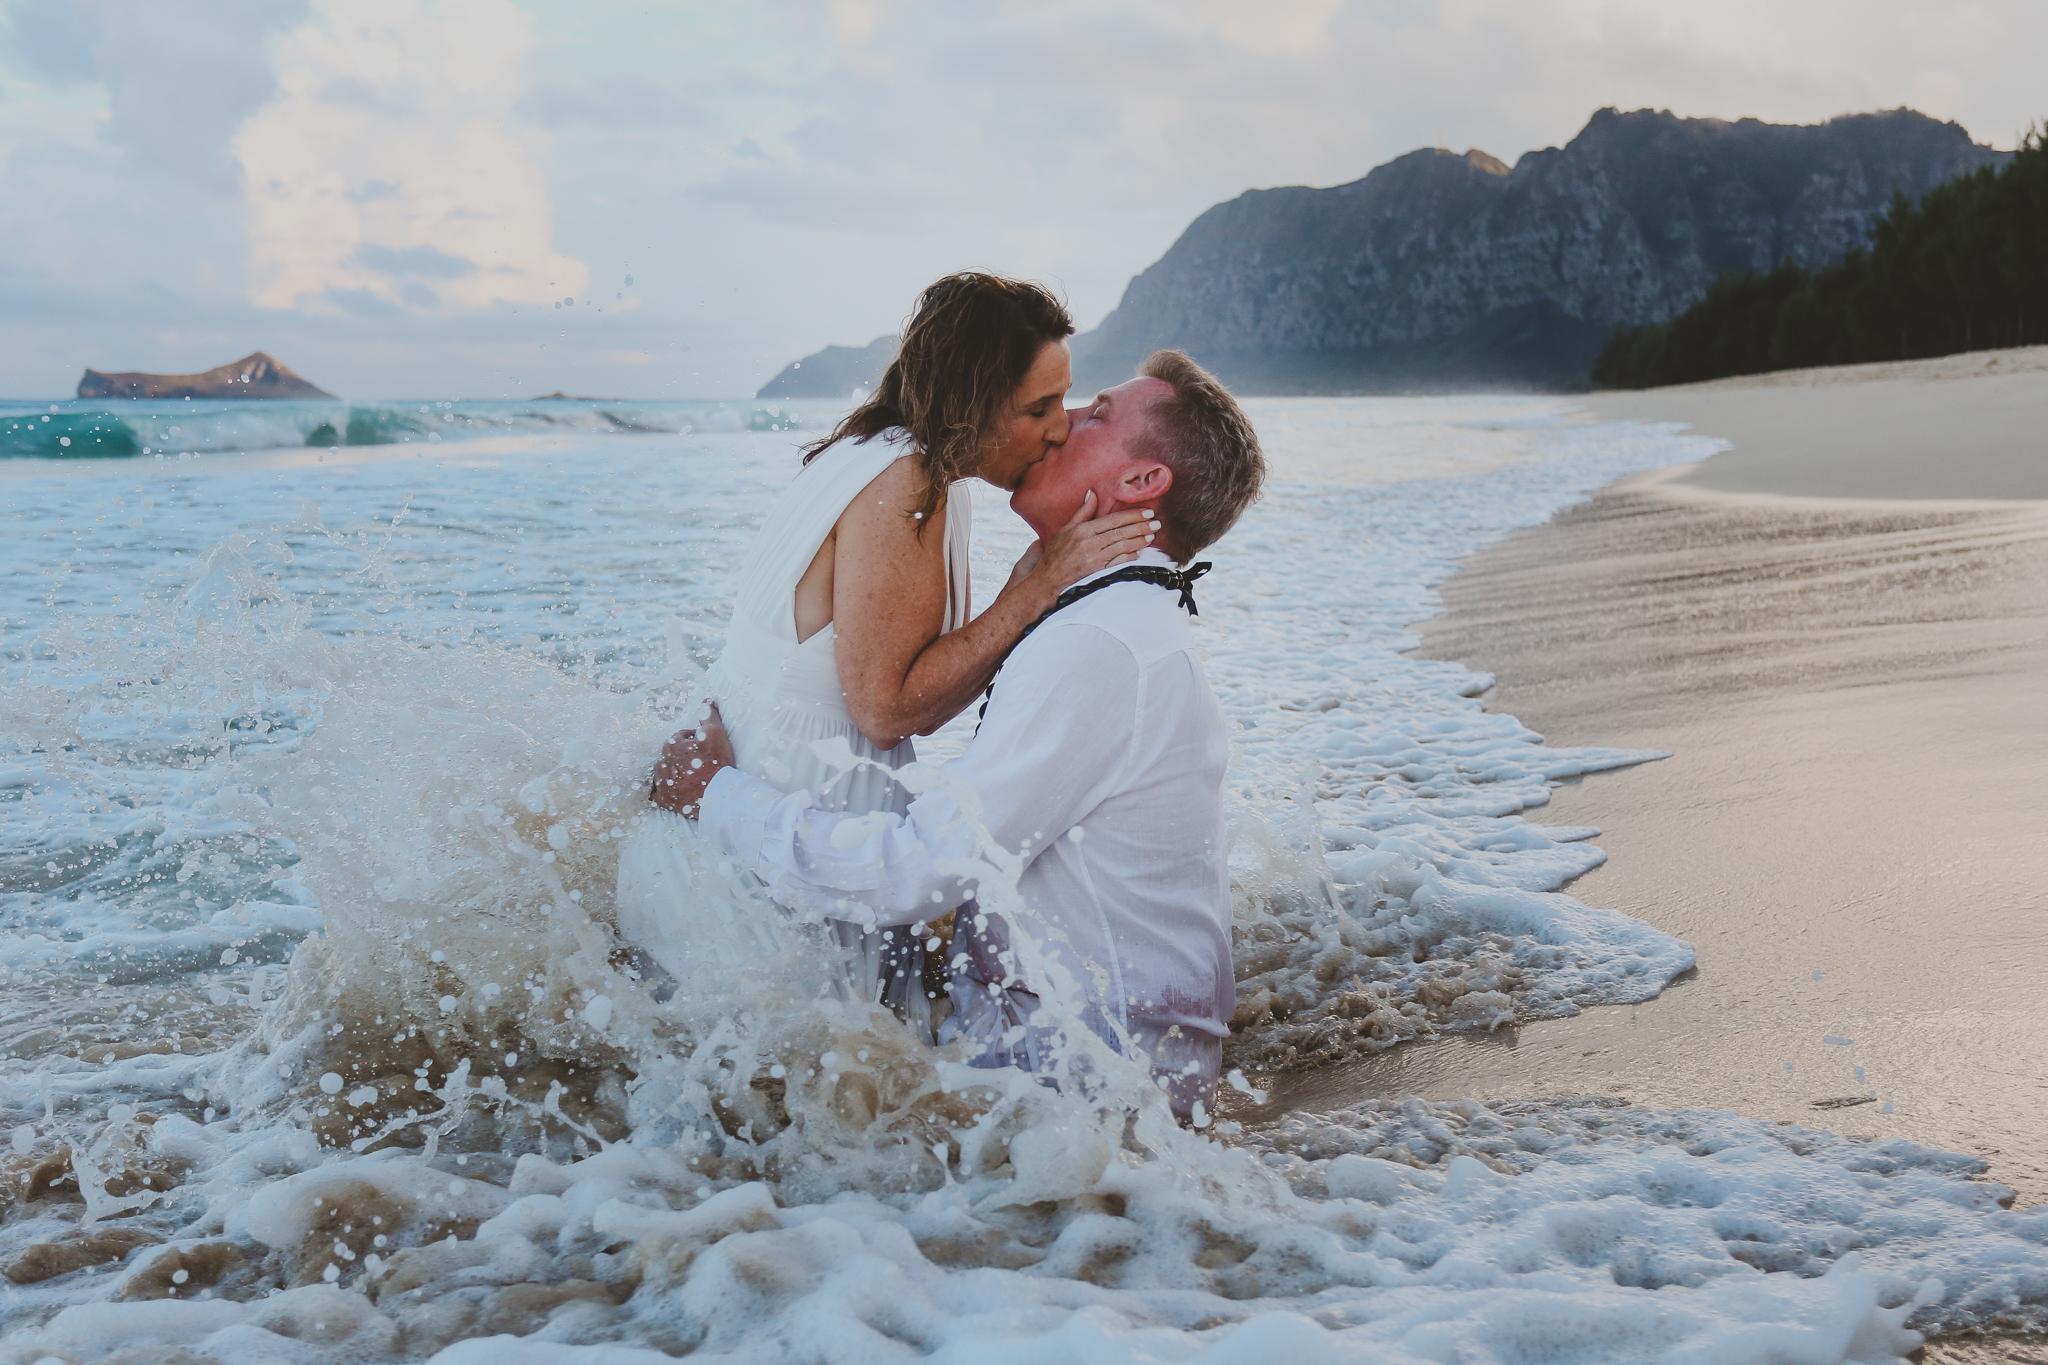 IG, aloha sunshine photography, beach wedding, hawaii photographer, hawaii, hawaii wedding, oahu wedding, hawaii wedding photographer, oahu wedding photographer,43January 31, 2018.jpg